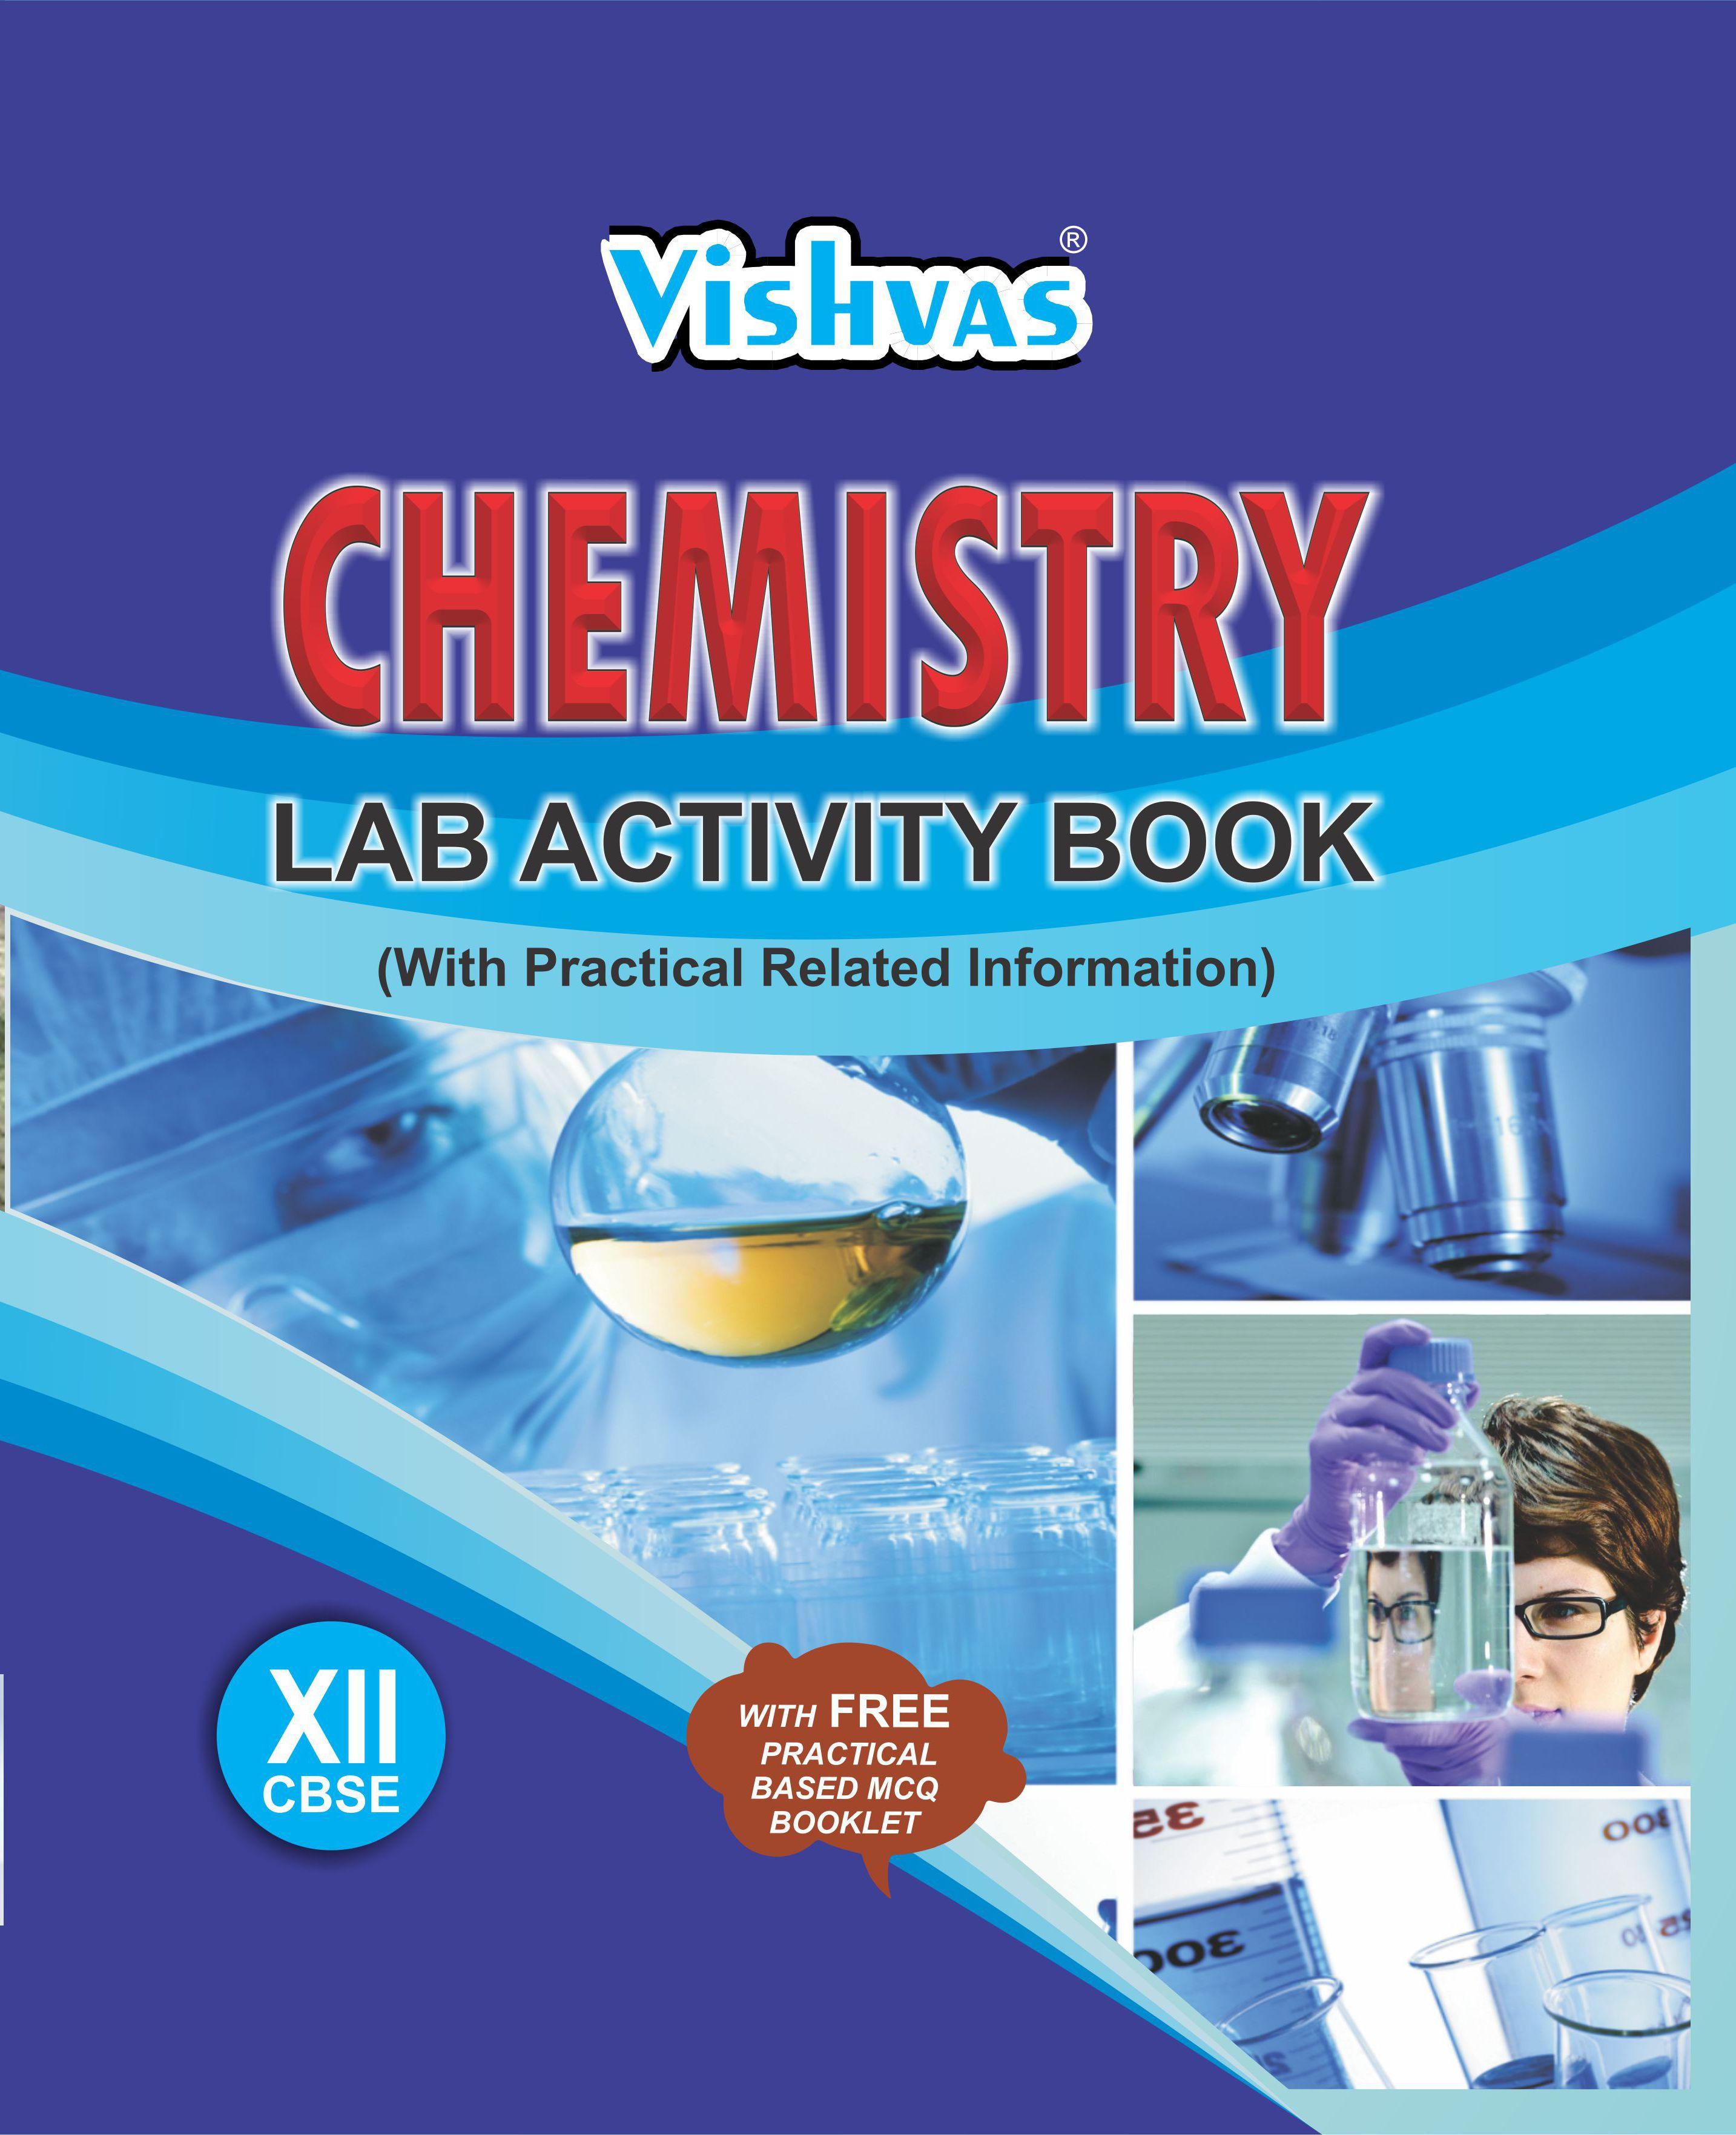 CBSE-2019-CHEMISTRY LAB ACTIVITY BOOK , Class-XII- (With FREE Practical  Based MCQ Booklet)Hardbound-vishvasbooks